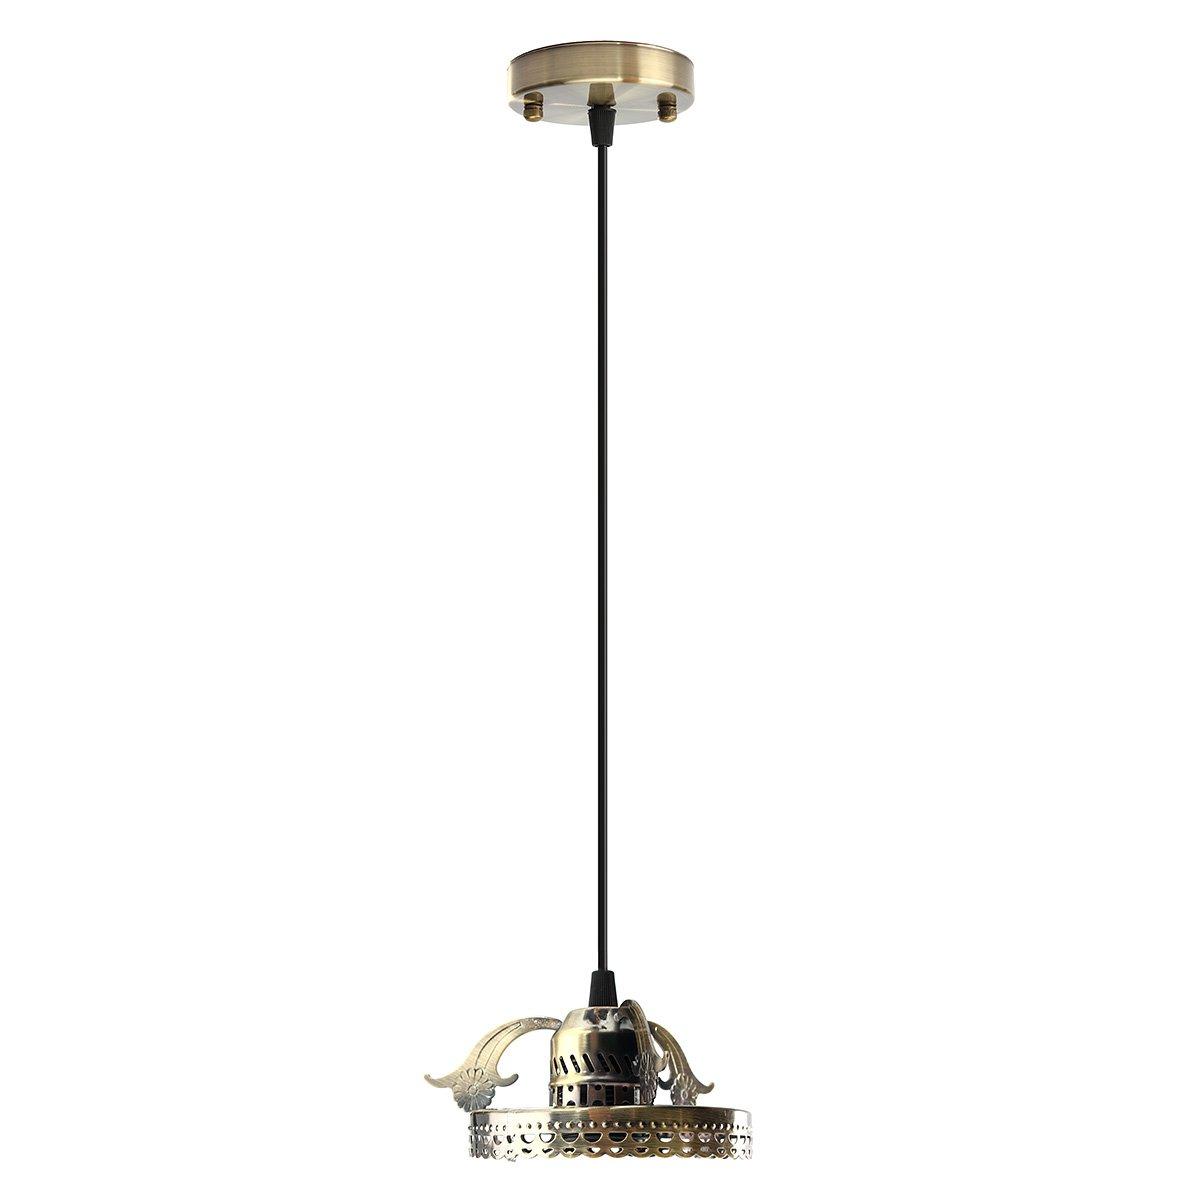 Hitommy Antique Industrial Vintage Ceiling Pendant Light Lamp Bulb Chandelier Fixture For Indoor Lighting - Bronze